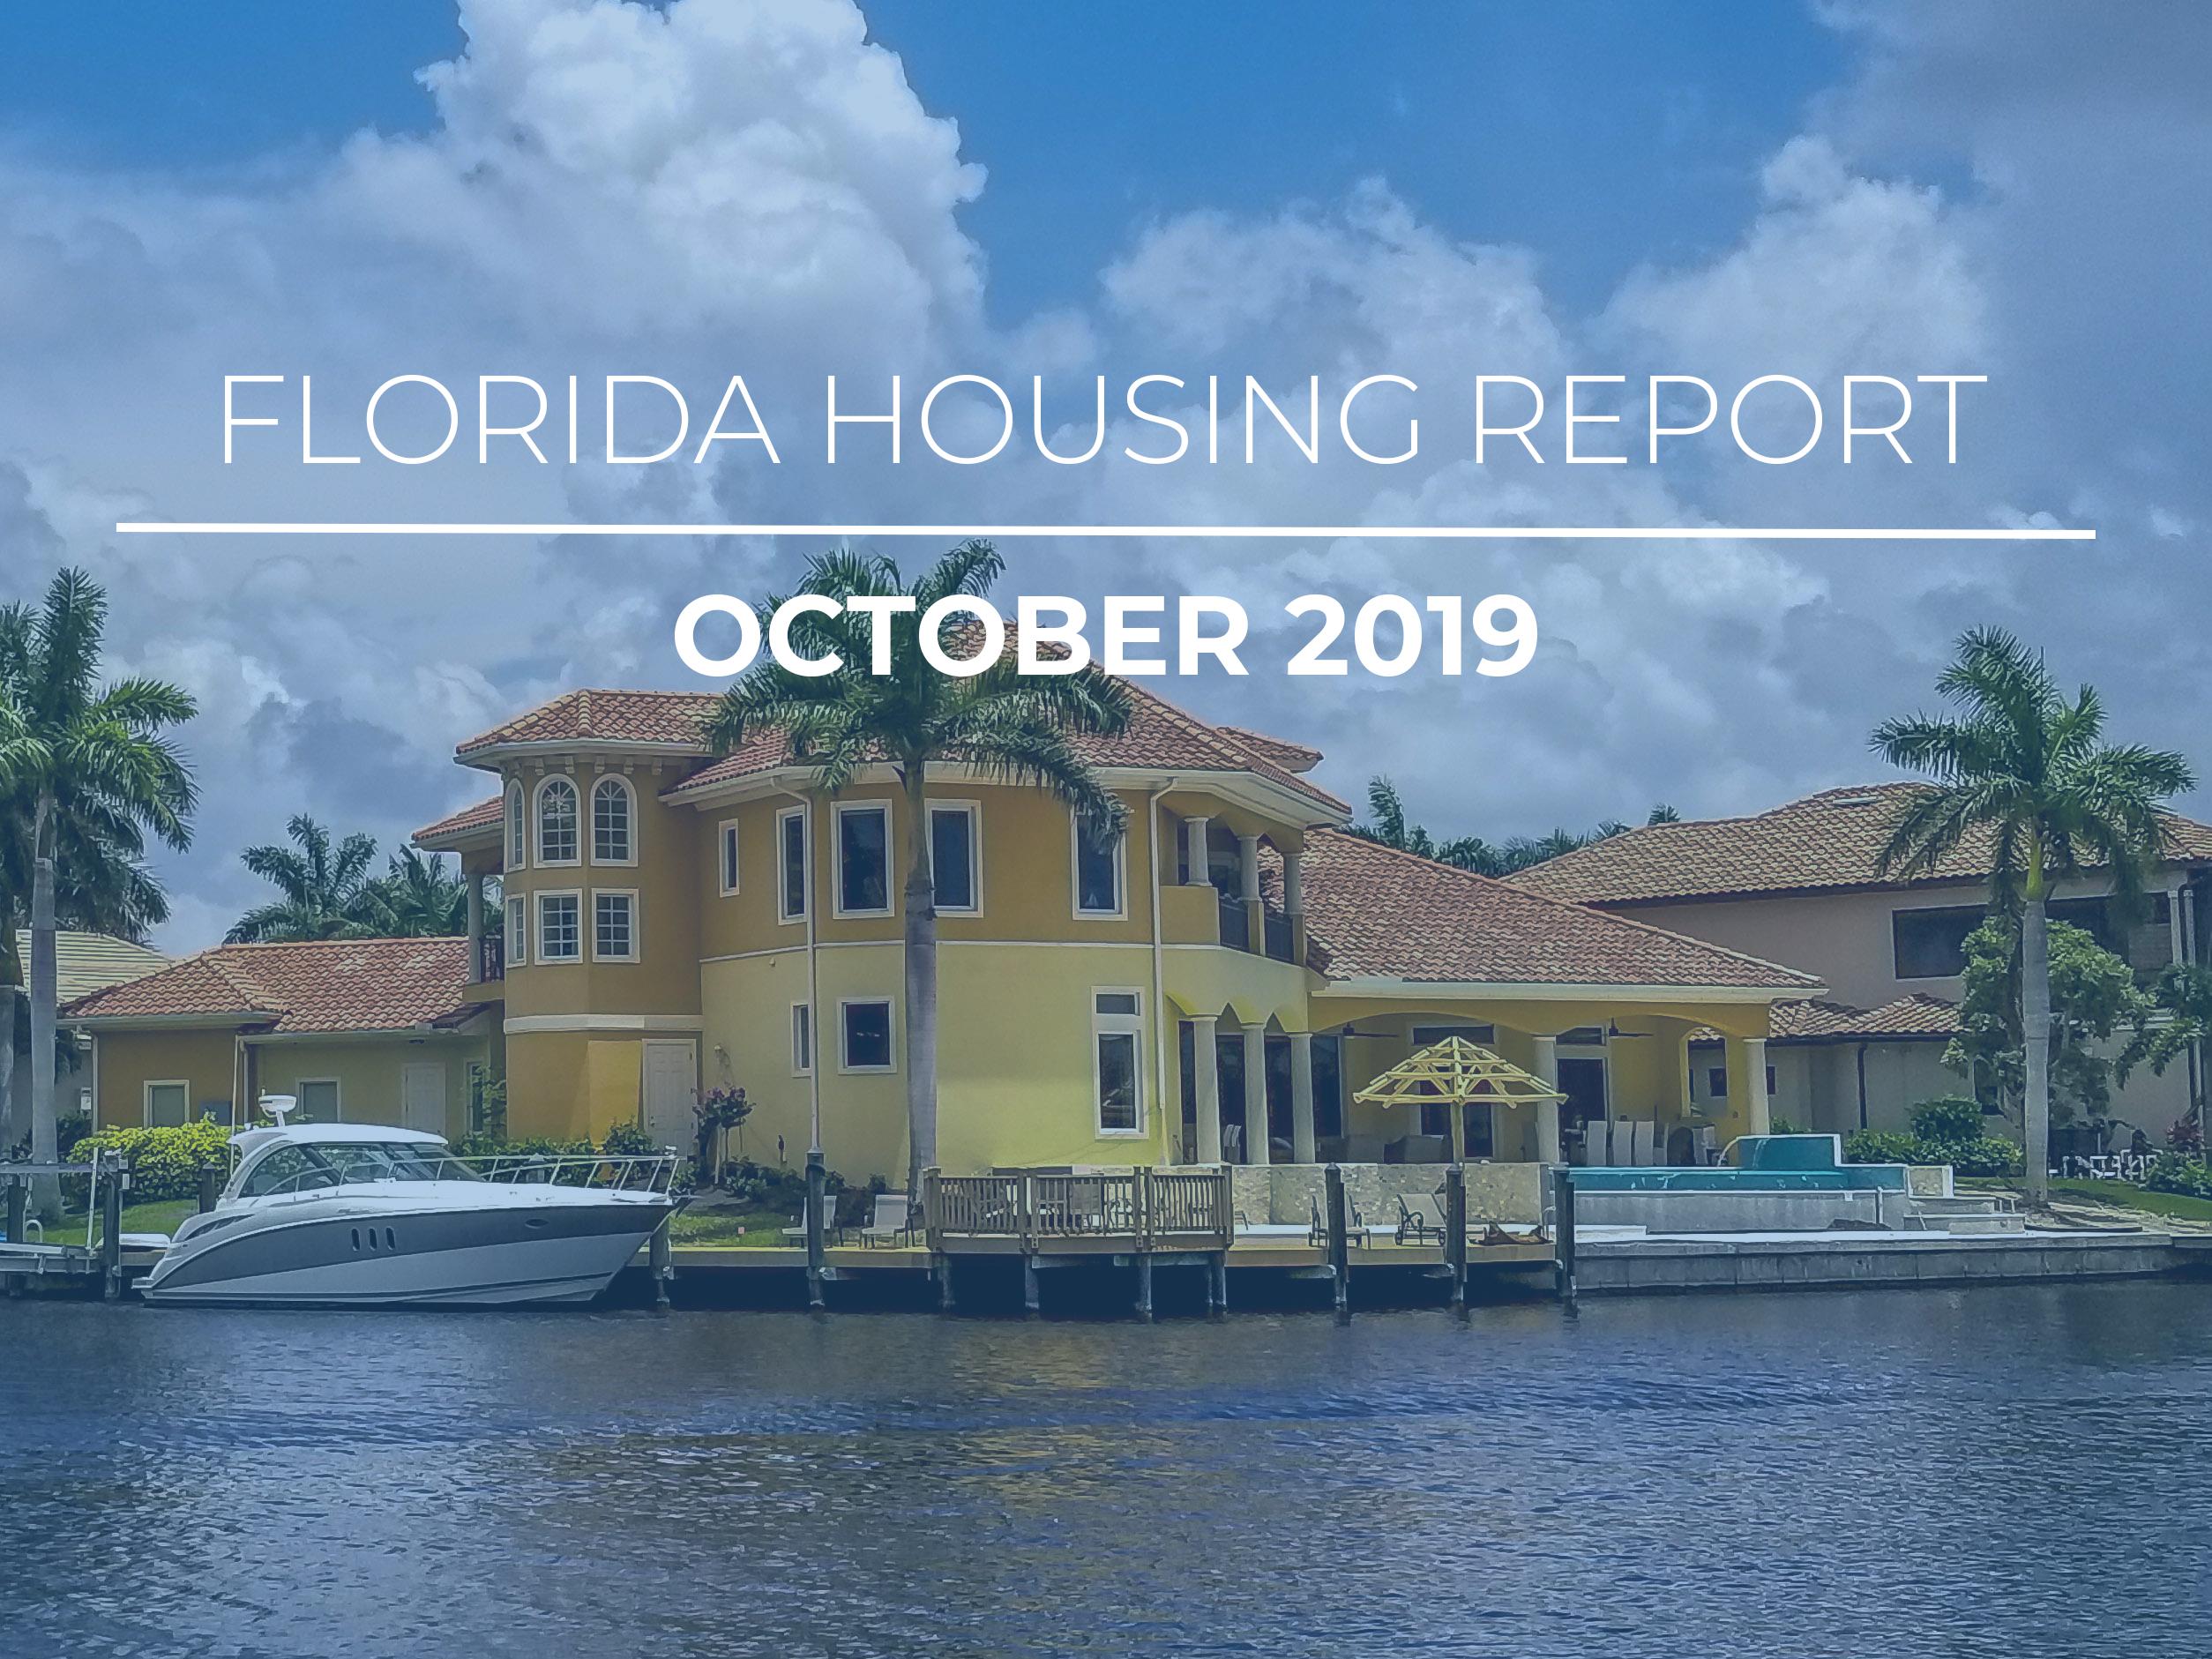 October 2019 Florida Housing Report